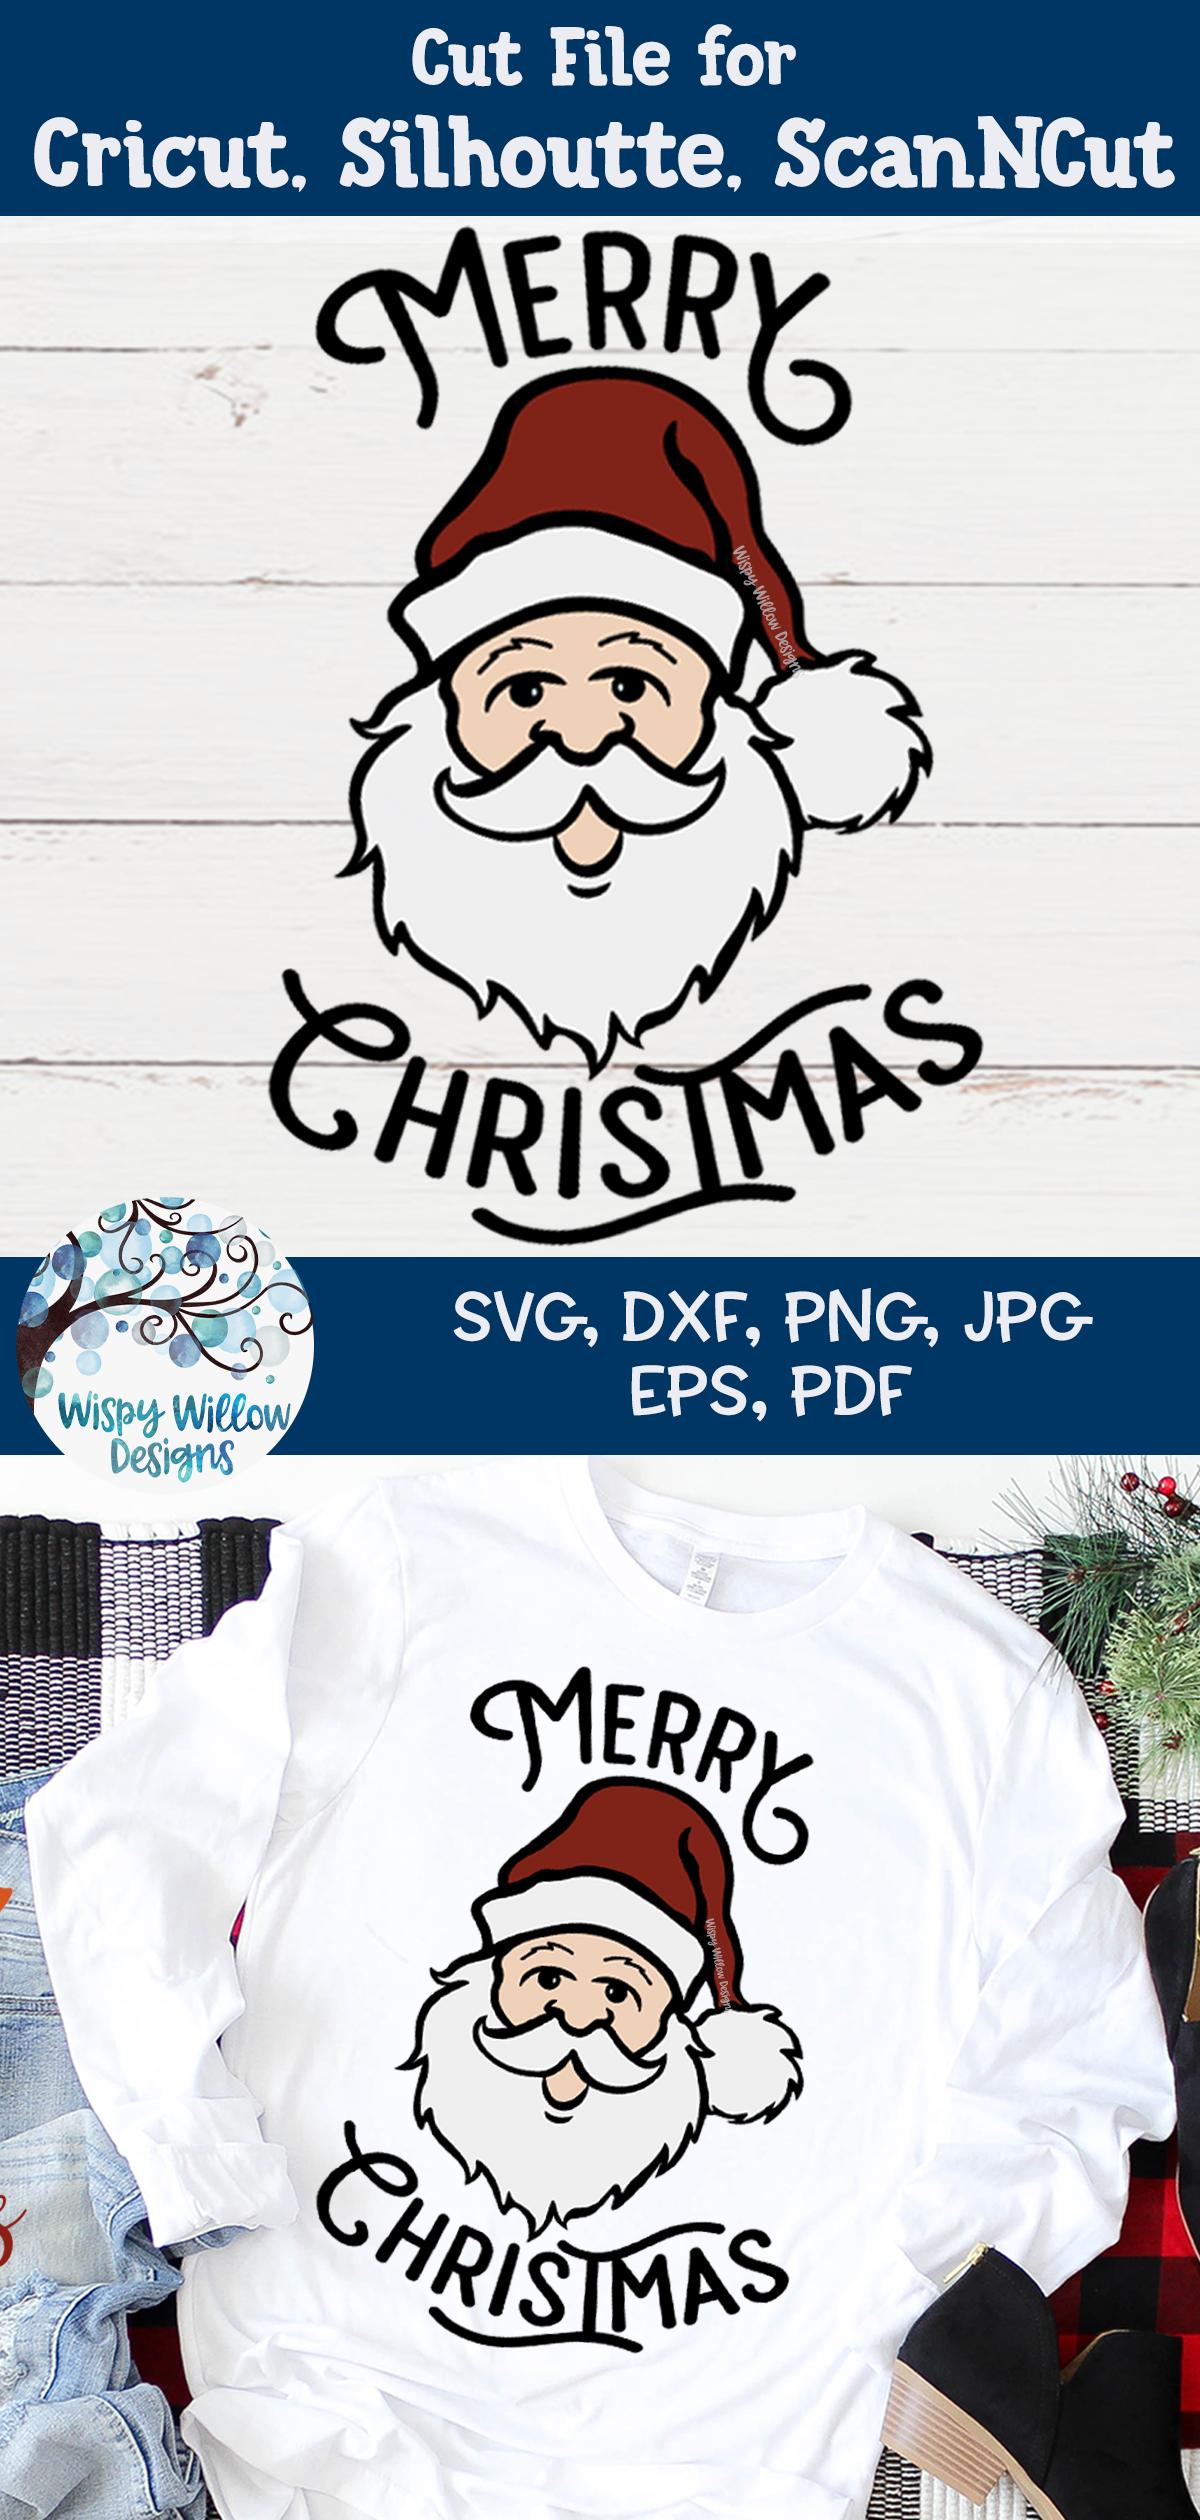 Merry Christmas Santa SVG | Retro Christmas Santa SVG File example image 4